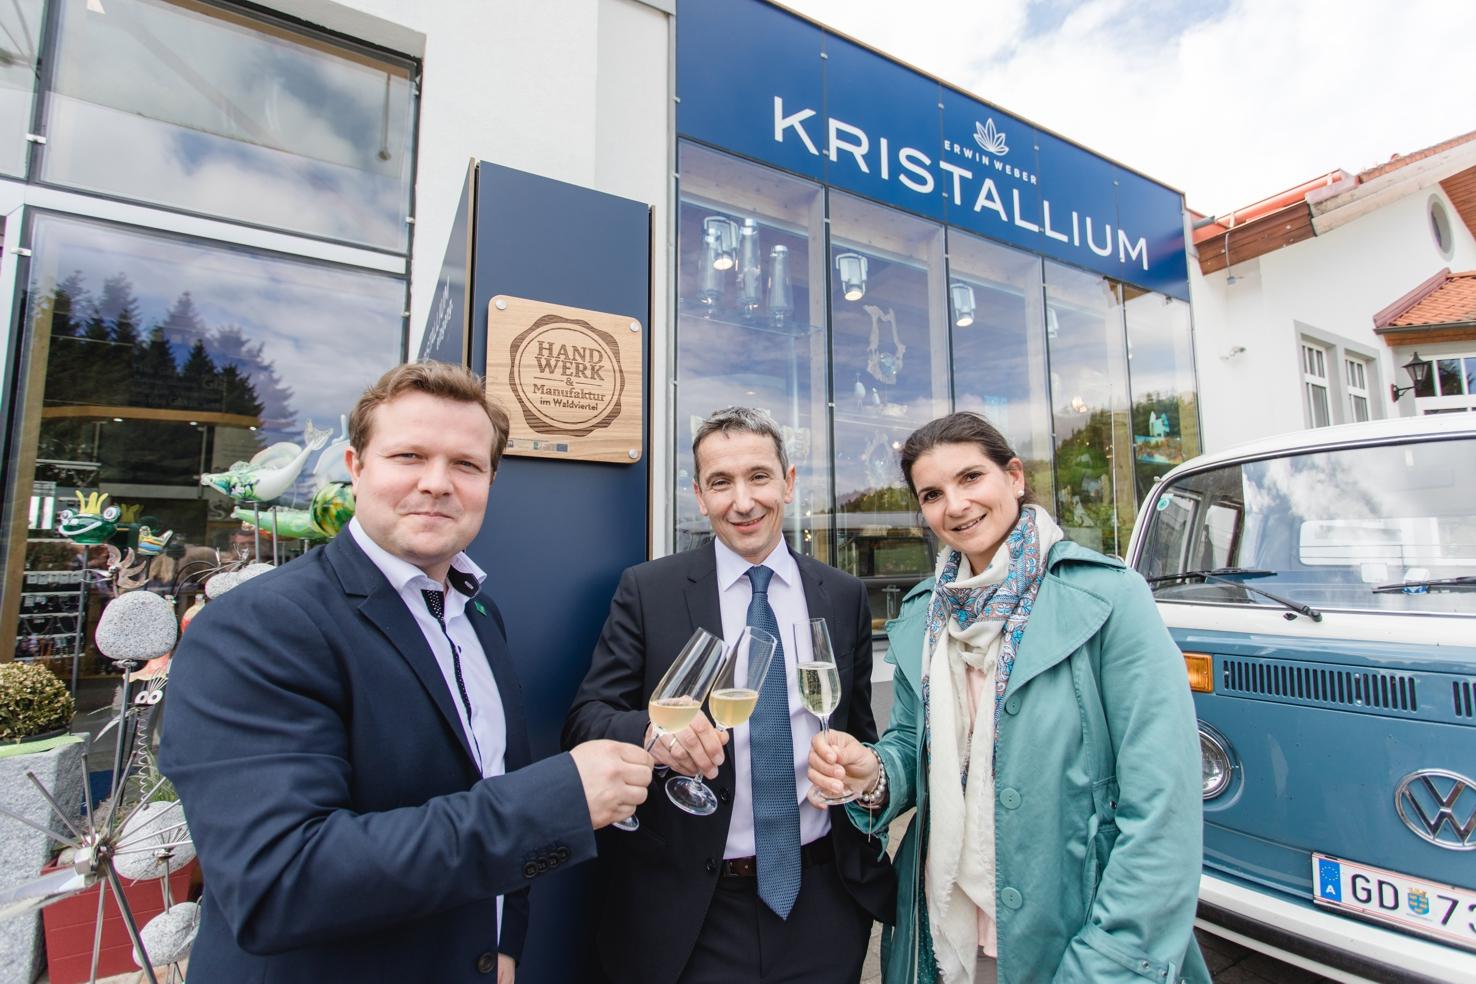 EröffnungKristallium-092